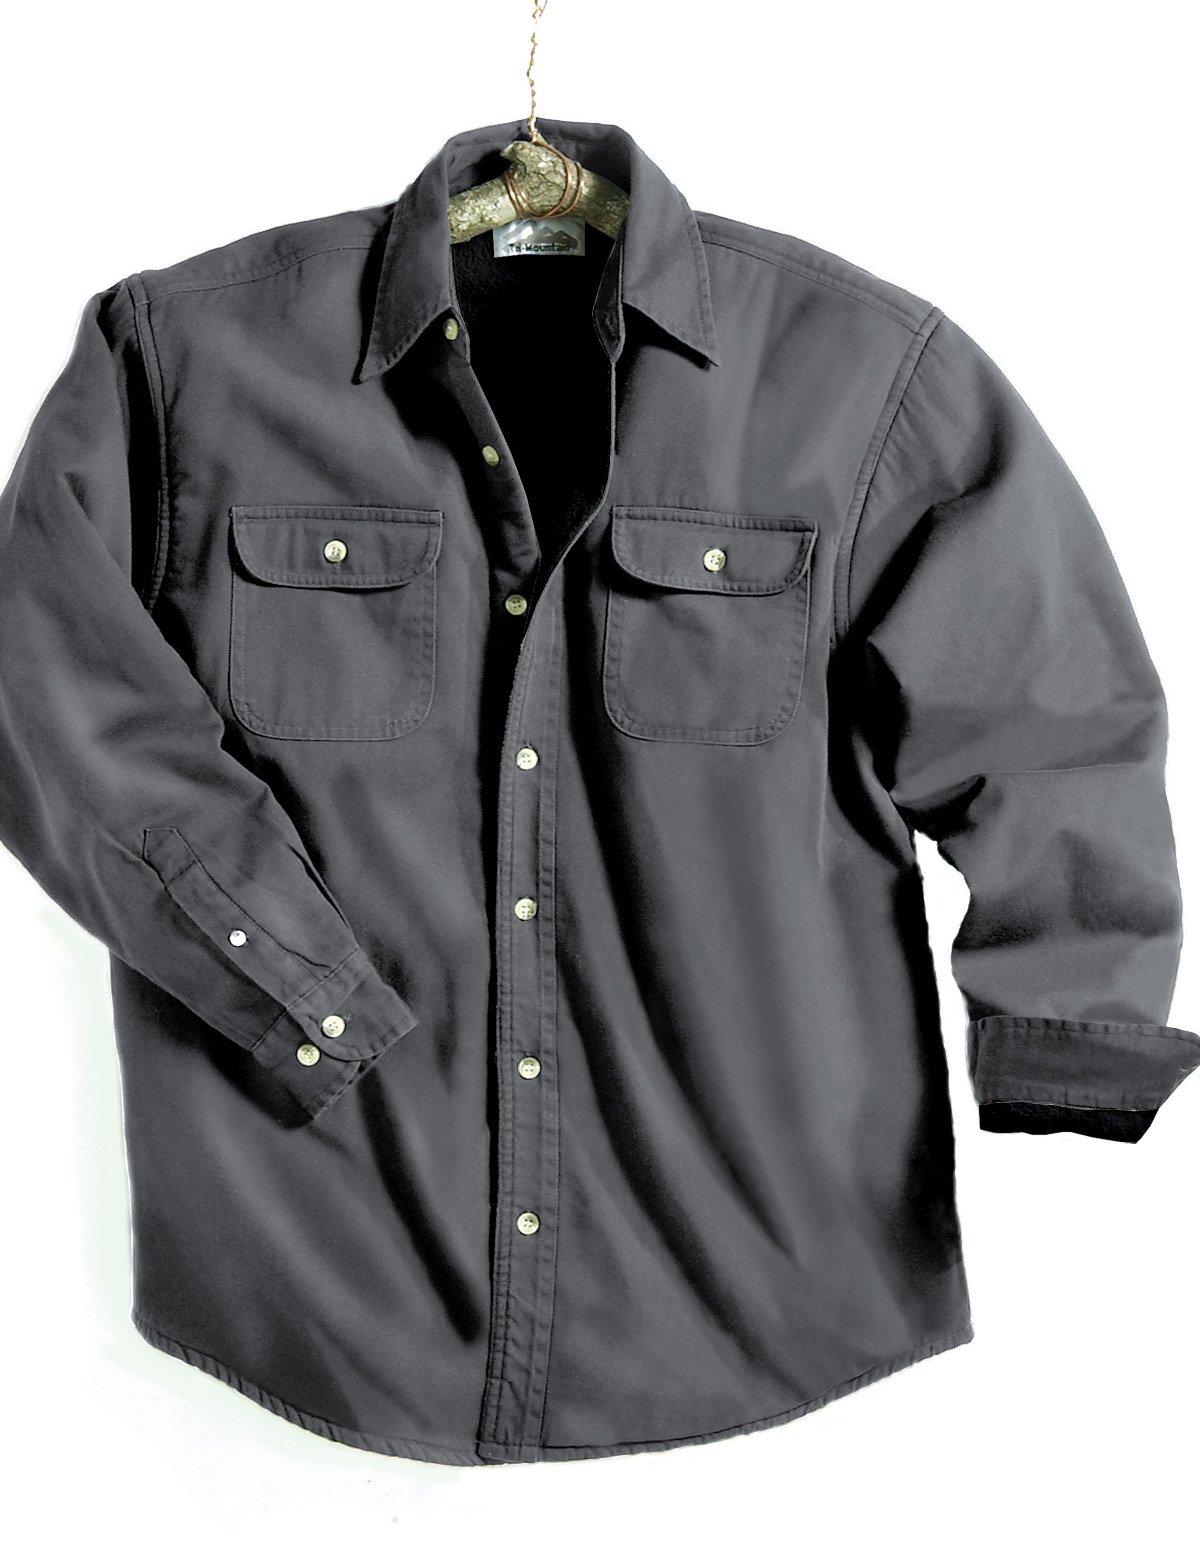 Tri-Mountain Men's 8 oz 100% Cotton Denim Stonewashed Jacket,Charcoal,2XL